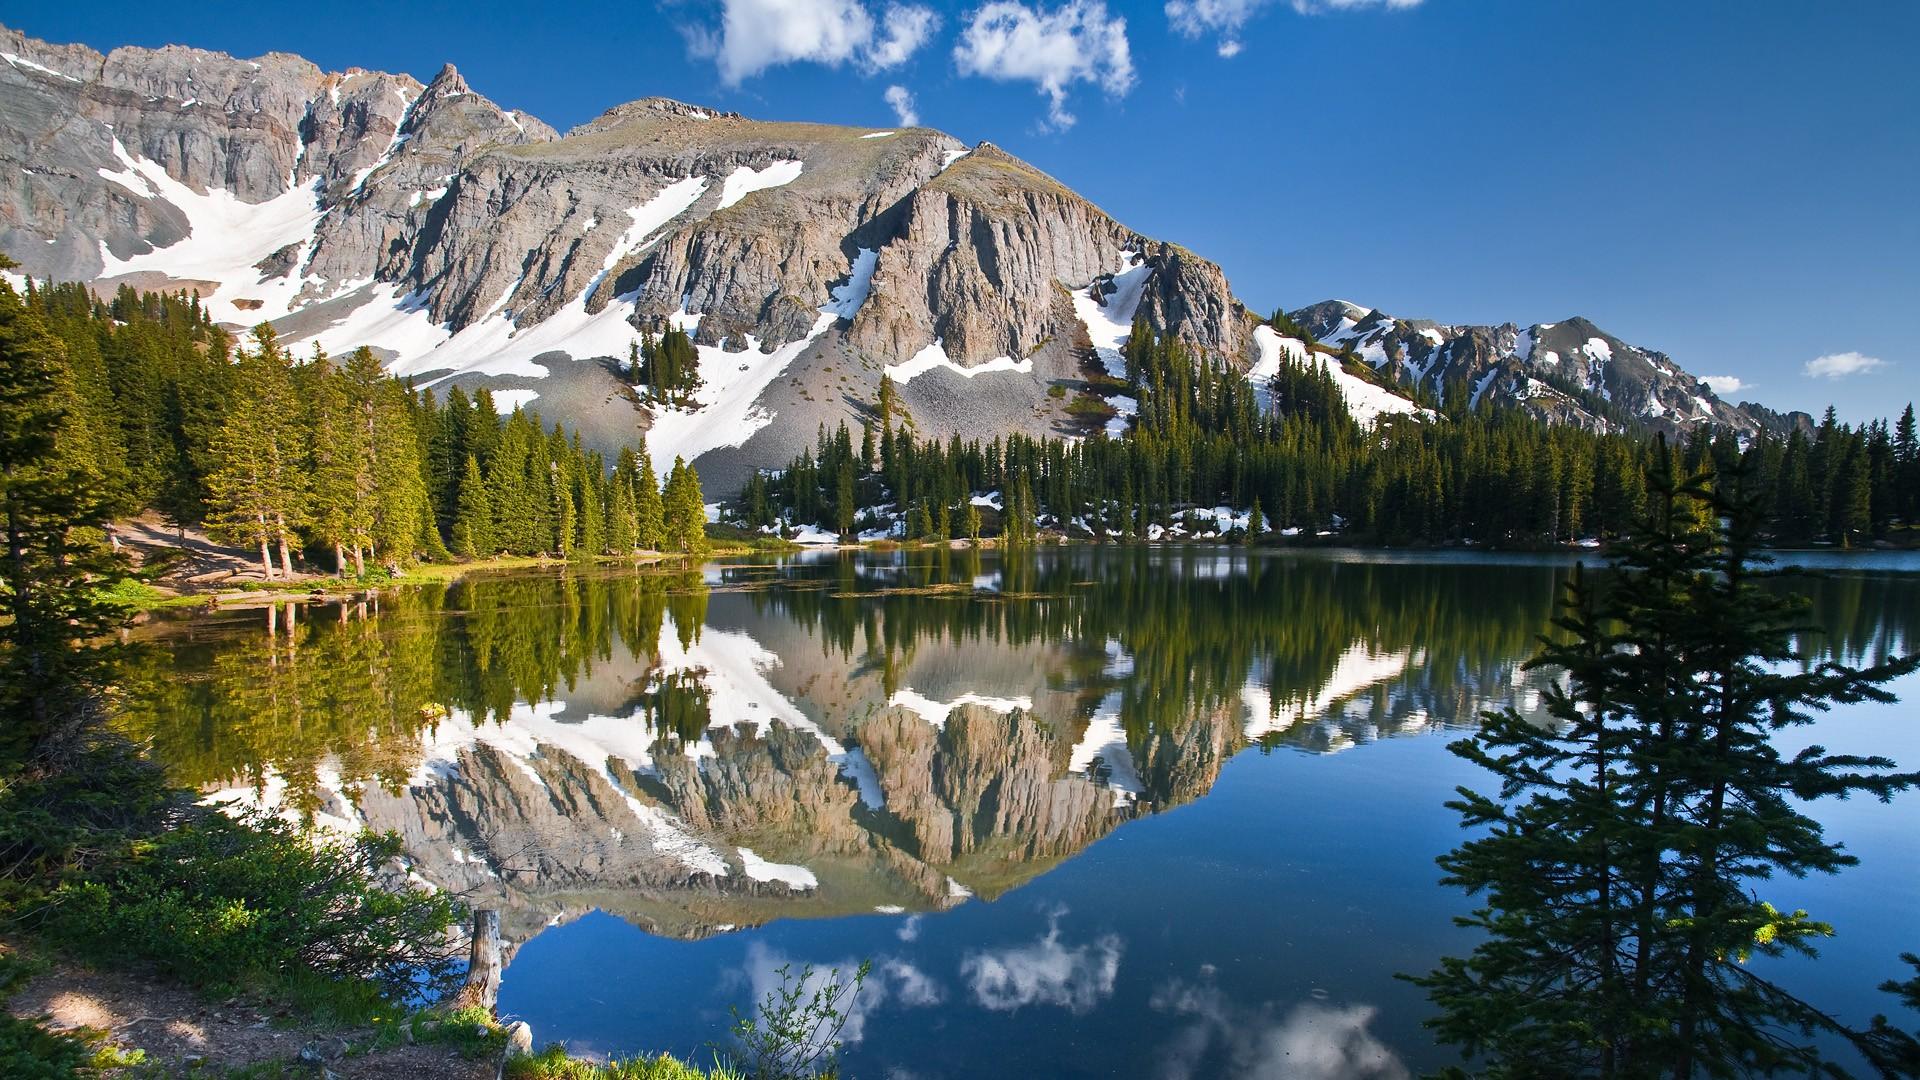 Rocky mountain desktop wallpaper wallpapersafari - Colorado desktop background ...